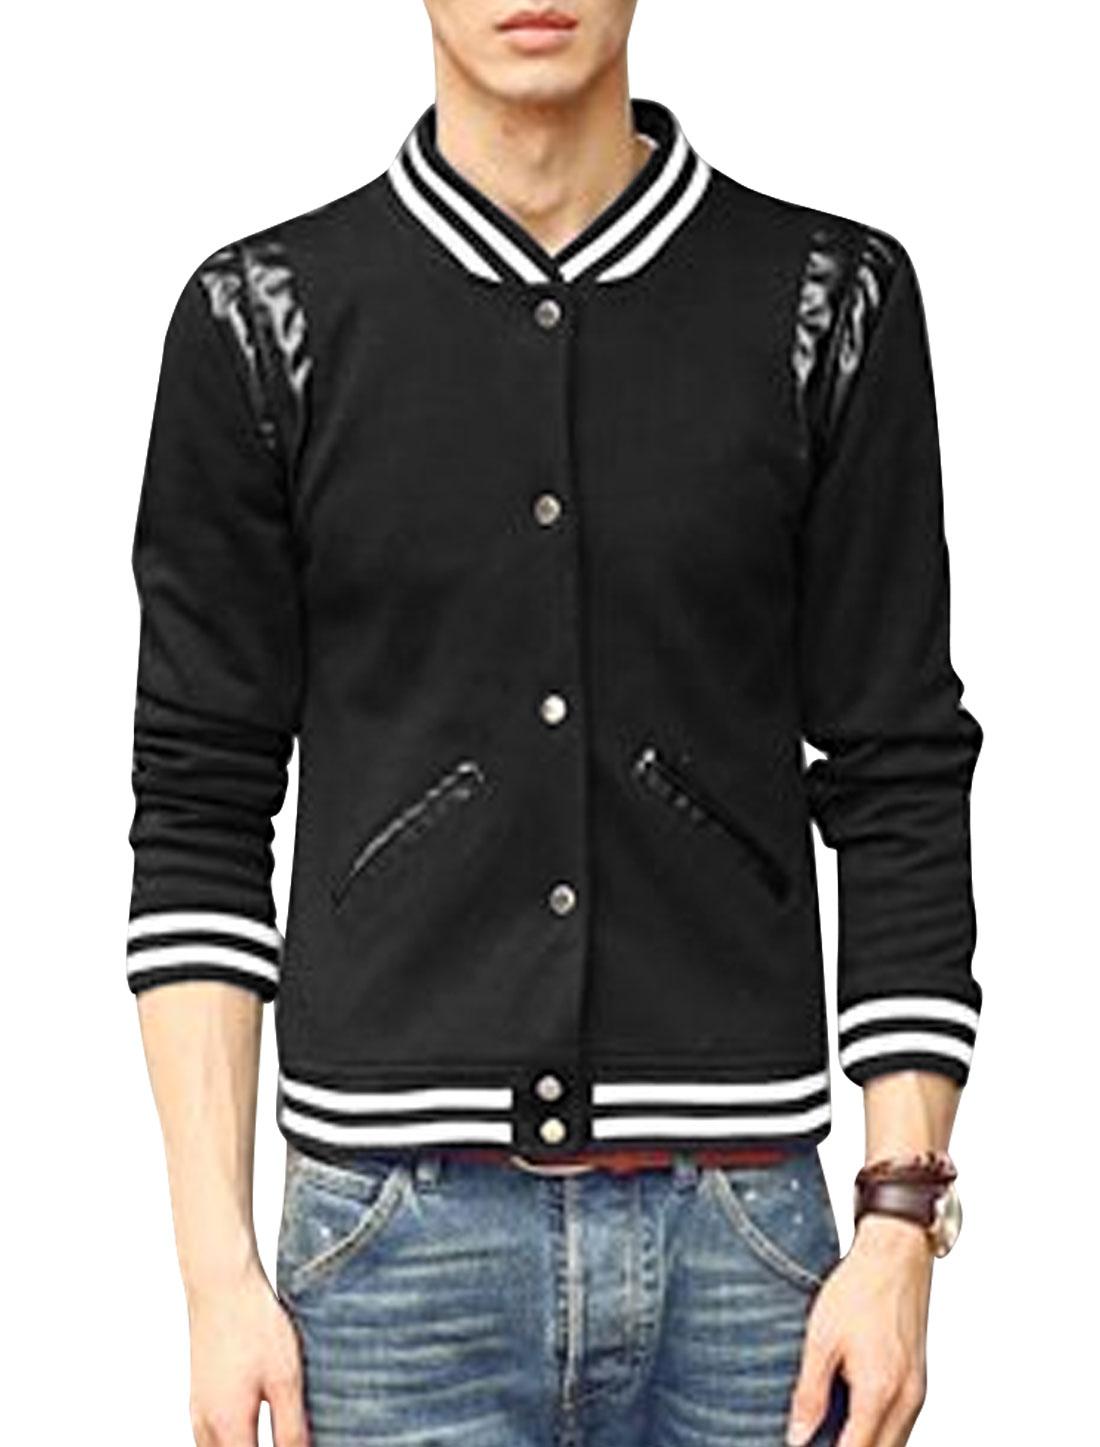 Men Ribbed Trim Front Pockets Long Sleeve Casual Baseball Jacket Black M